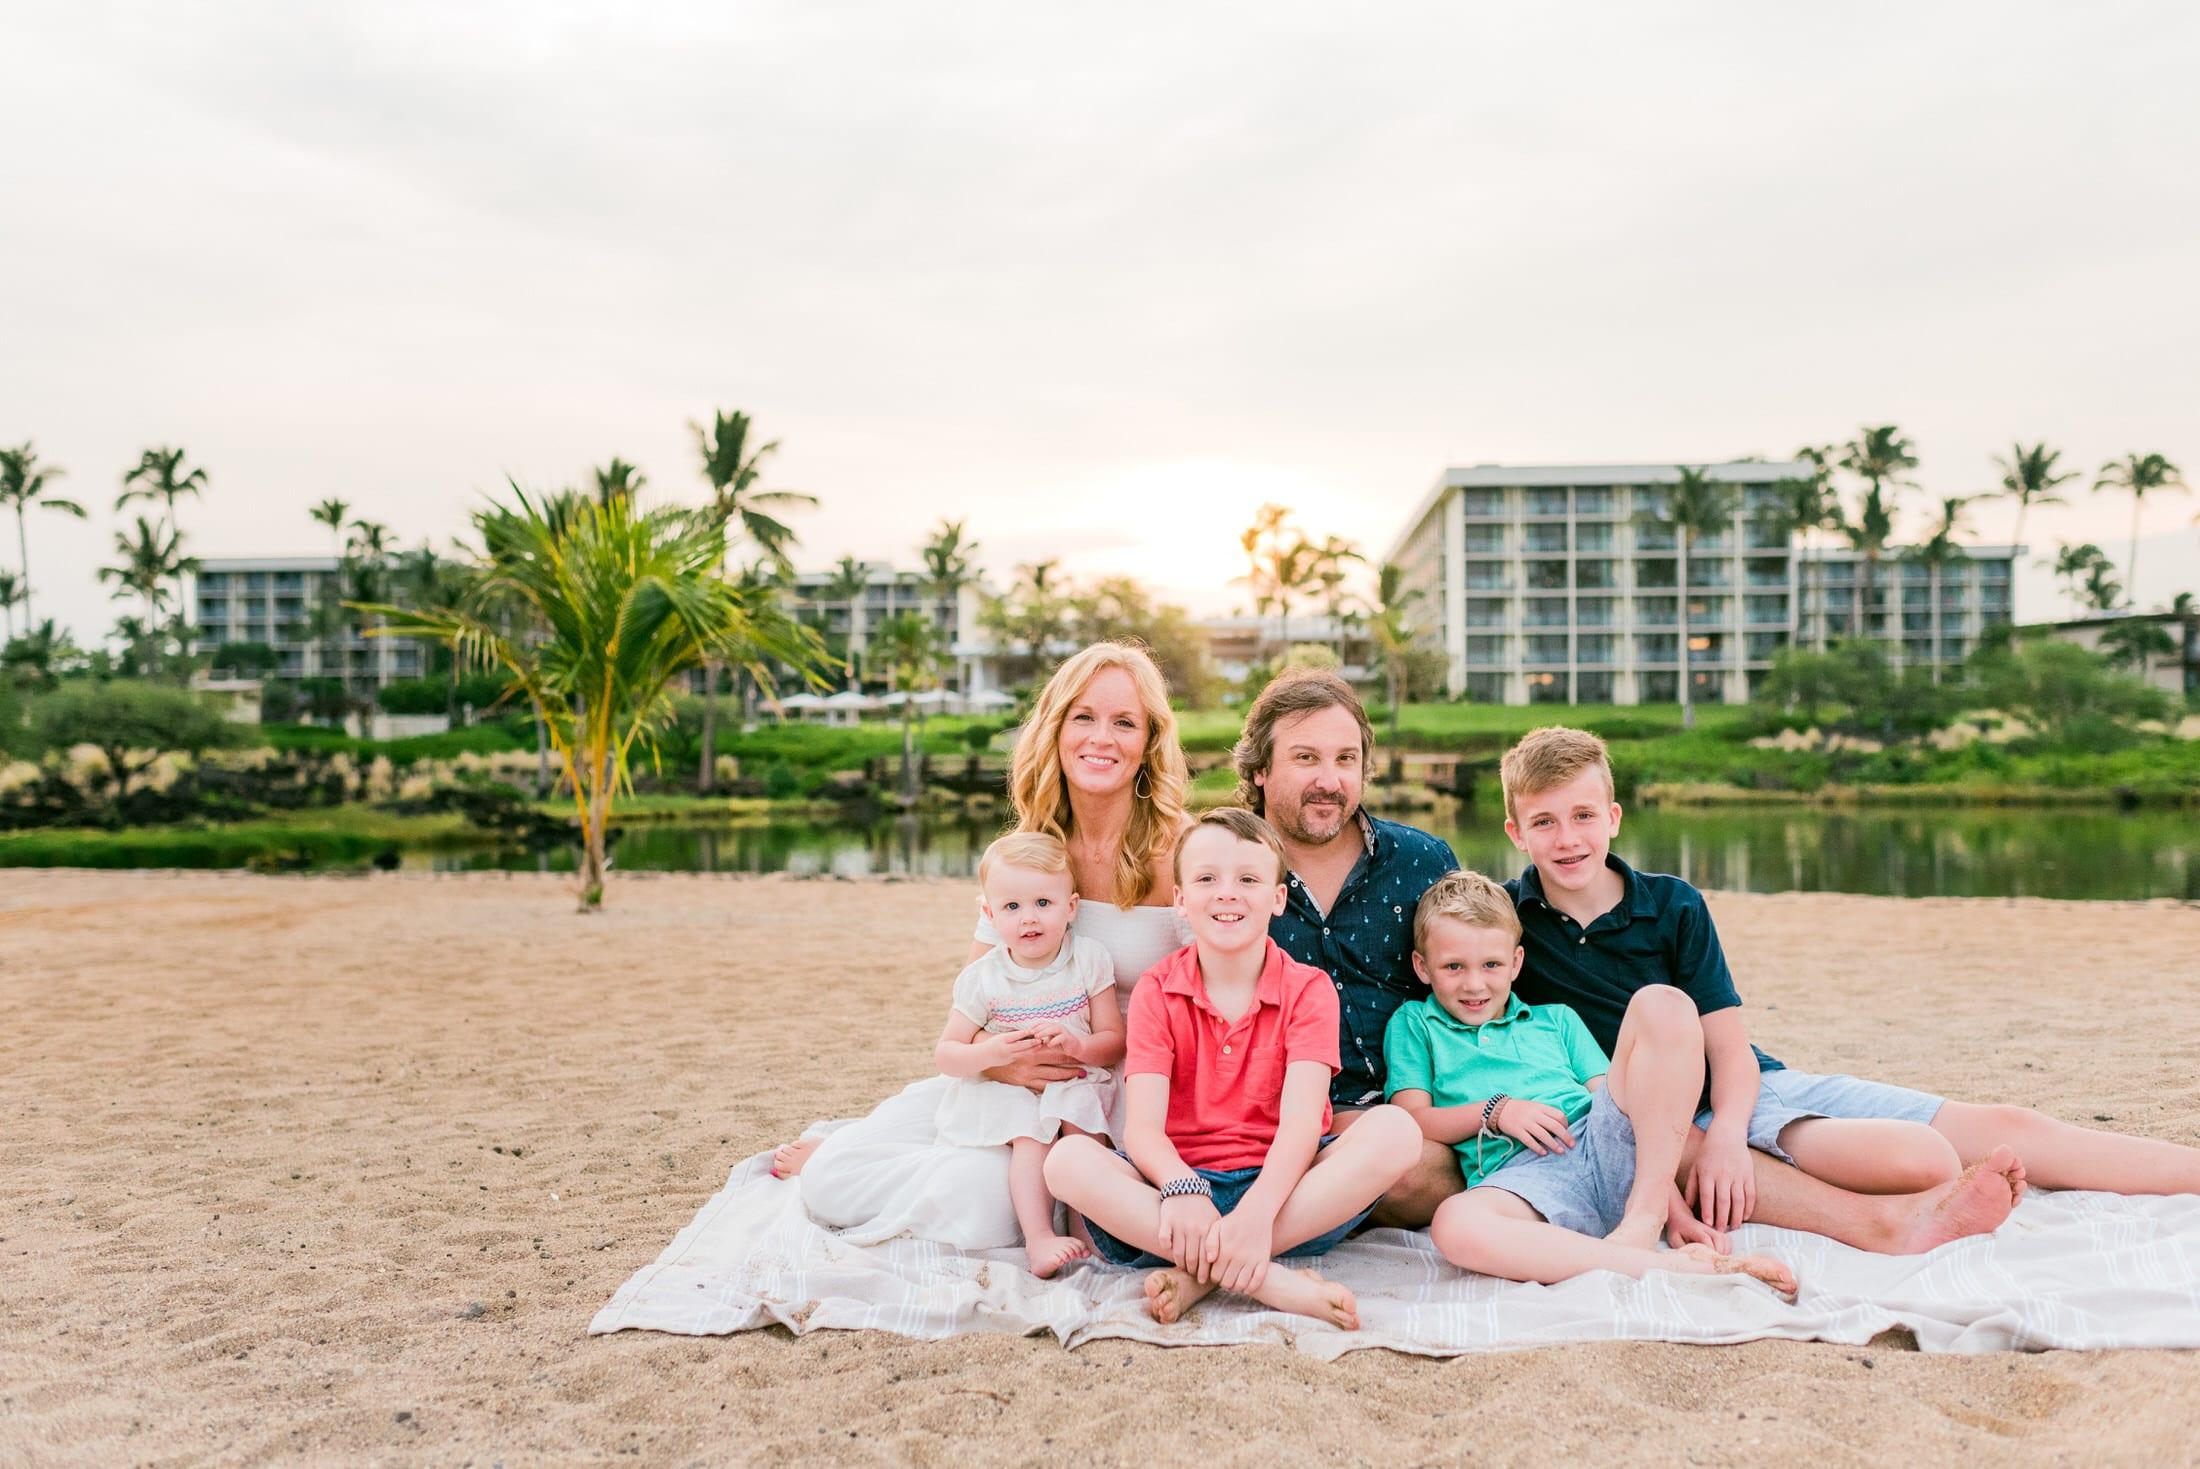 Waikoloa-Beach-Family-Photographer-Hawaii-26-1.jpg